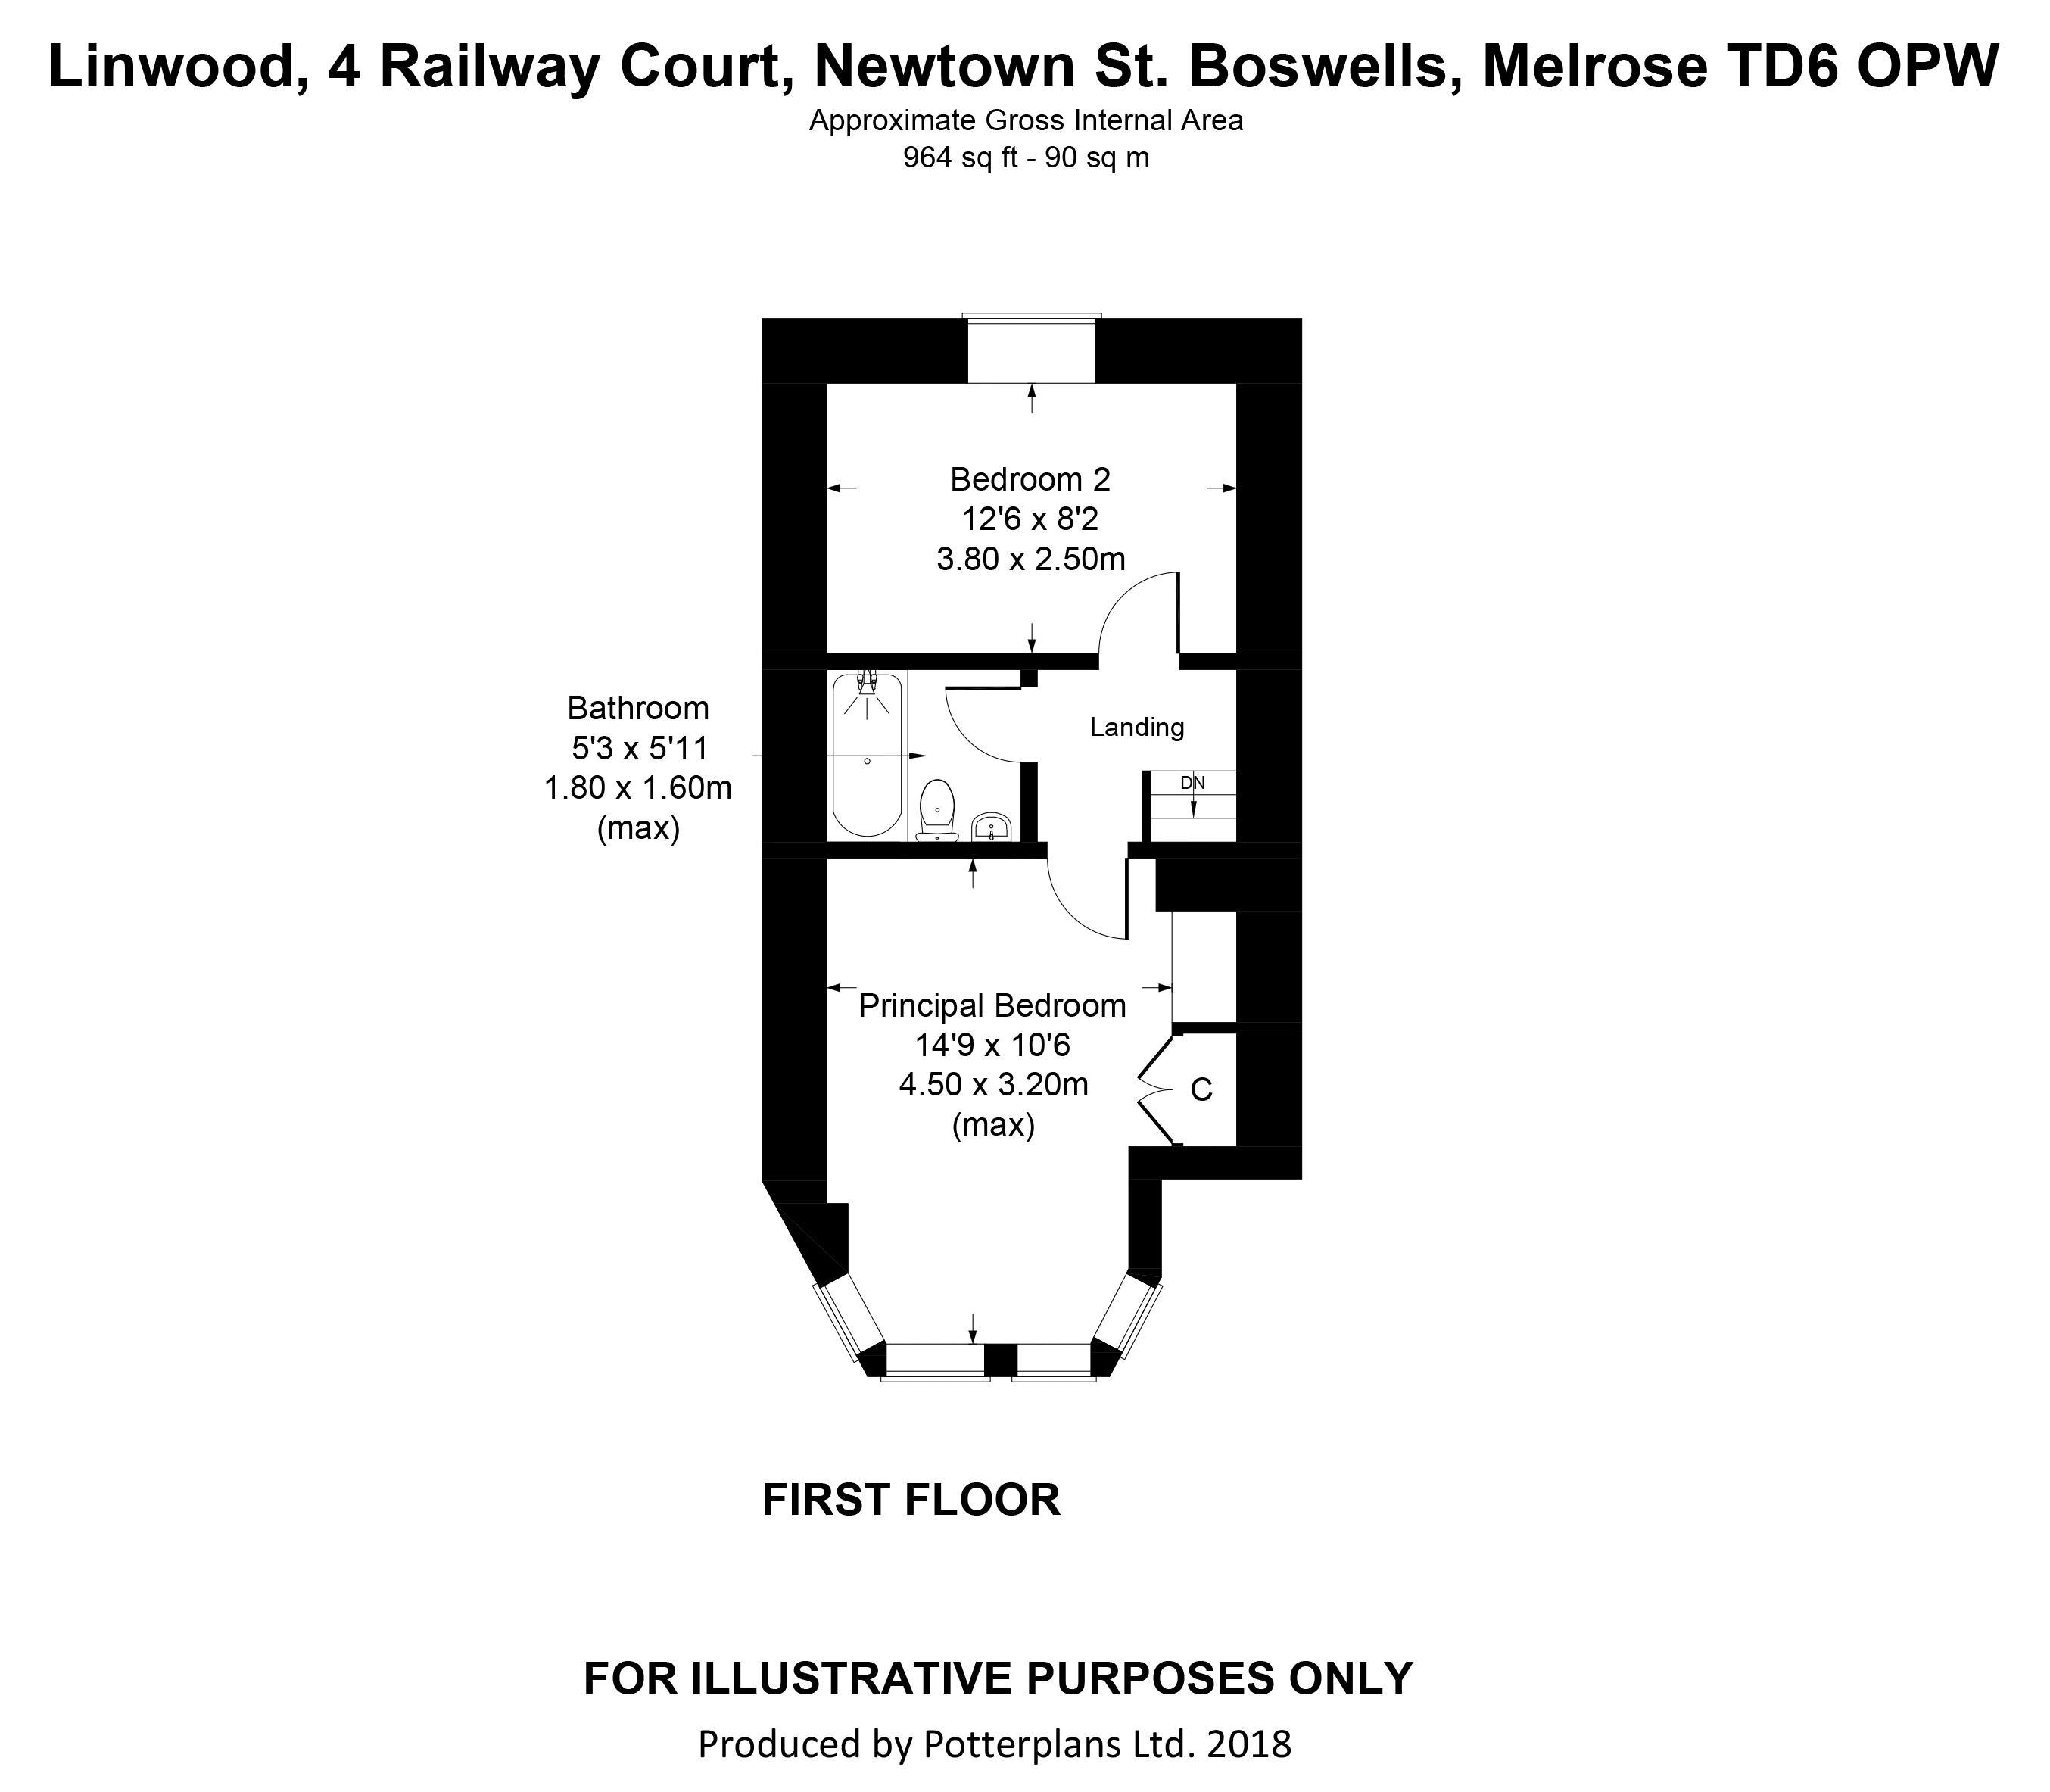 Linwood First Floor